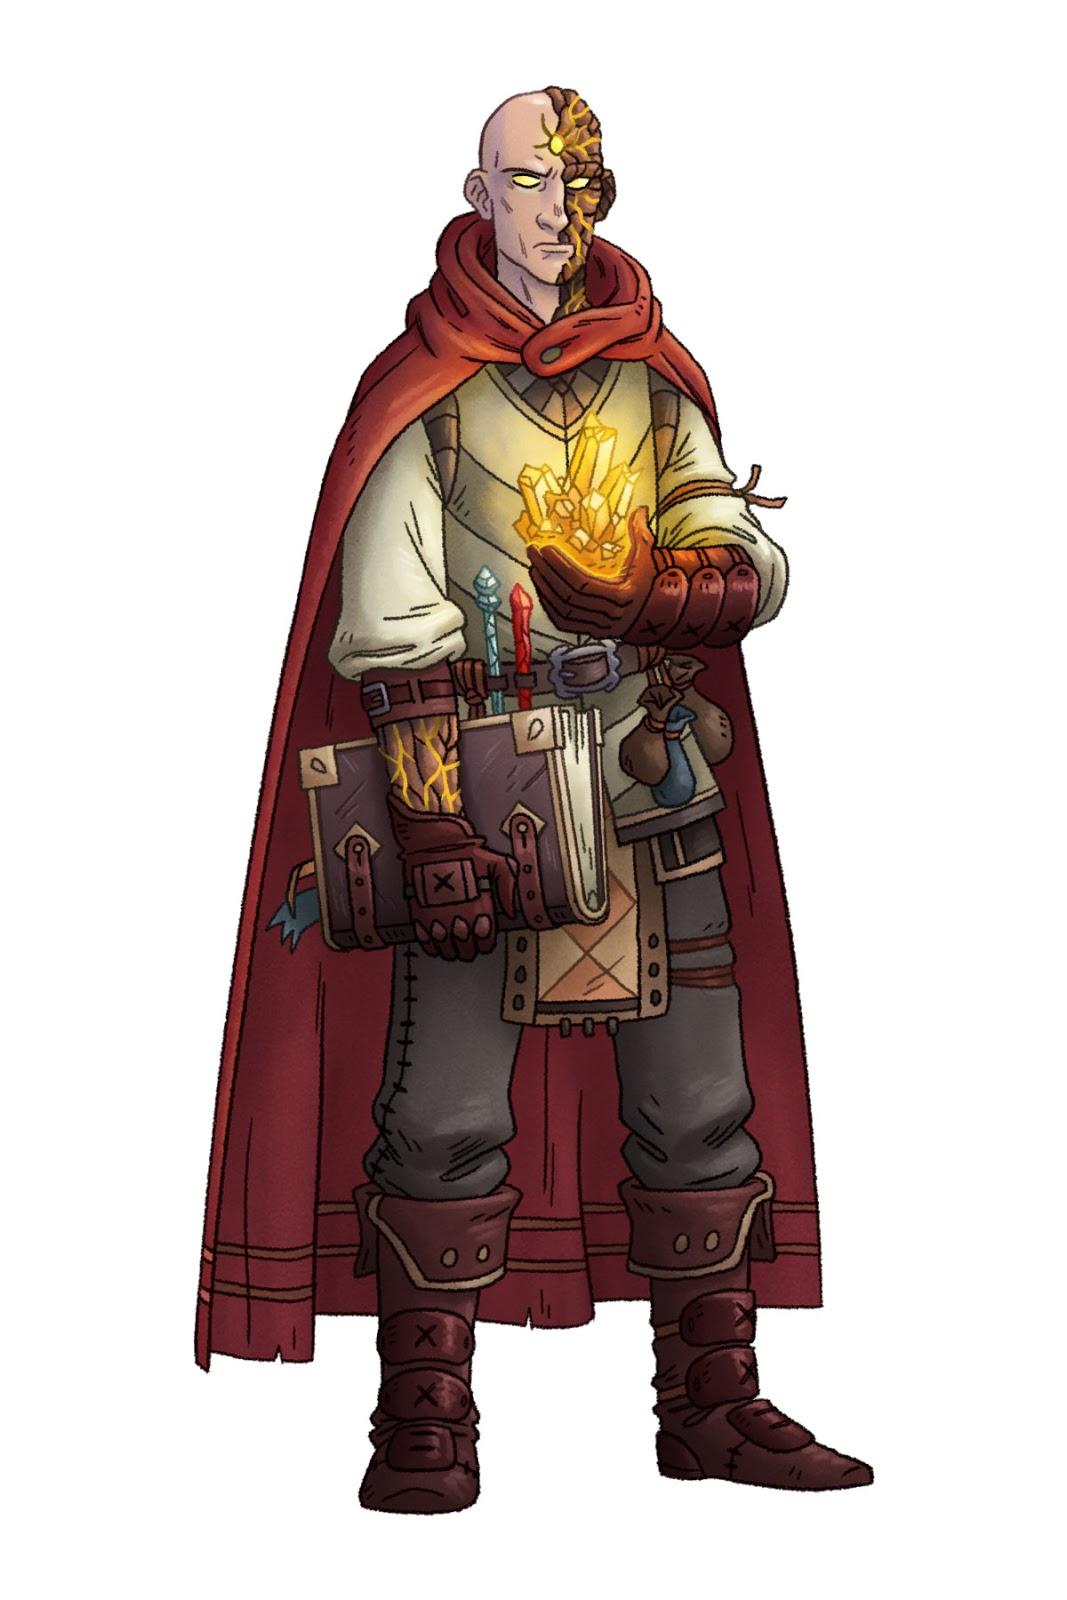 Psionic Magic | Superpower Wiki | FANDOM powered by Wikia